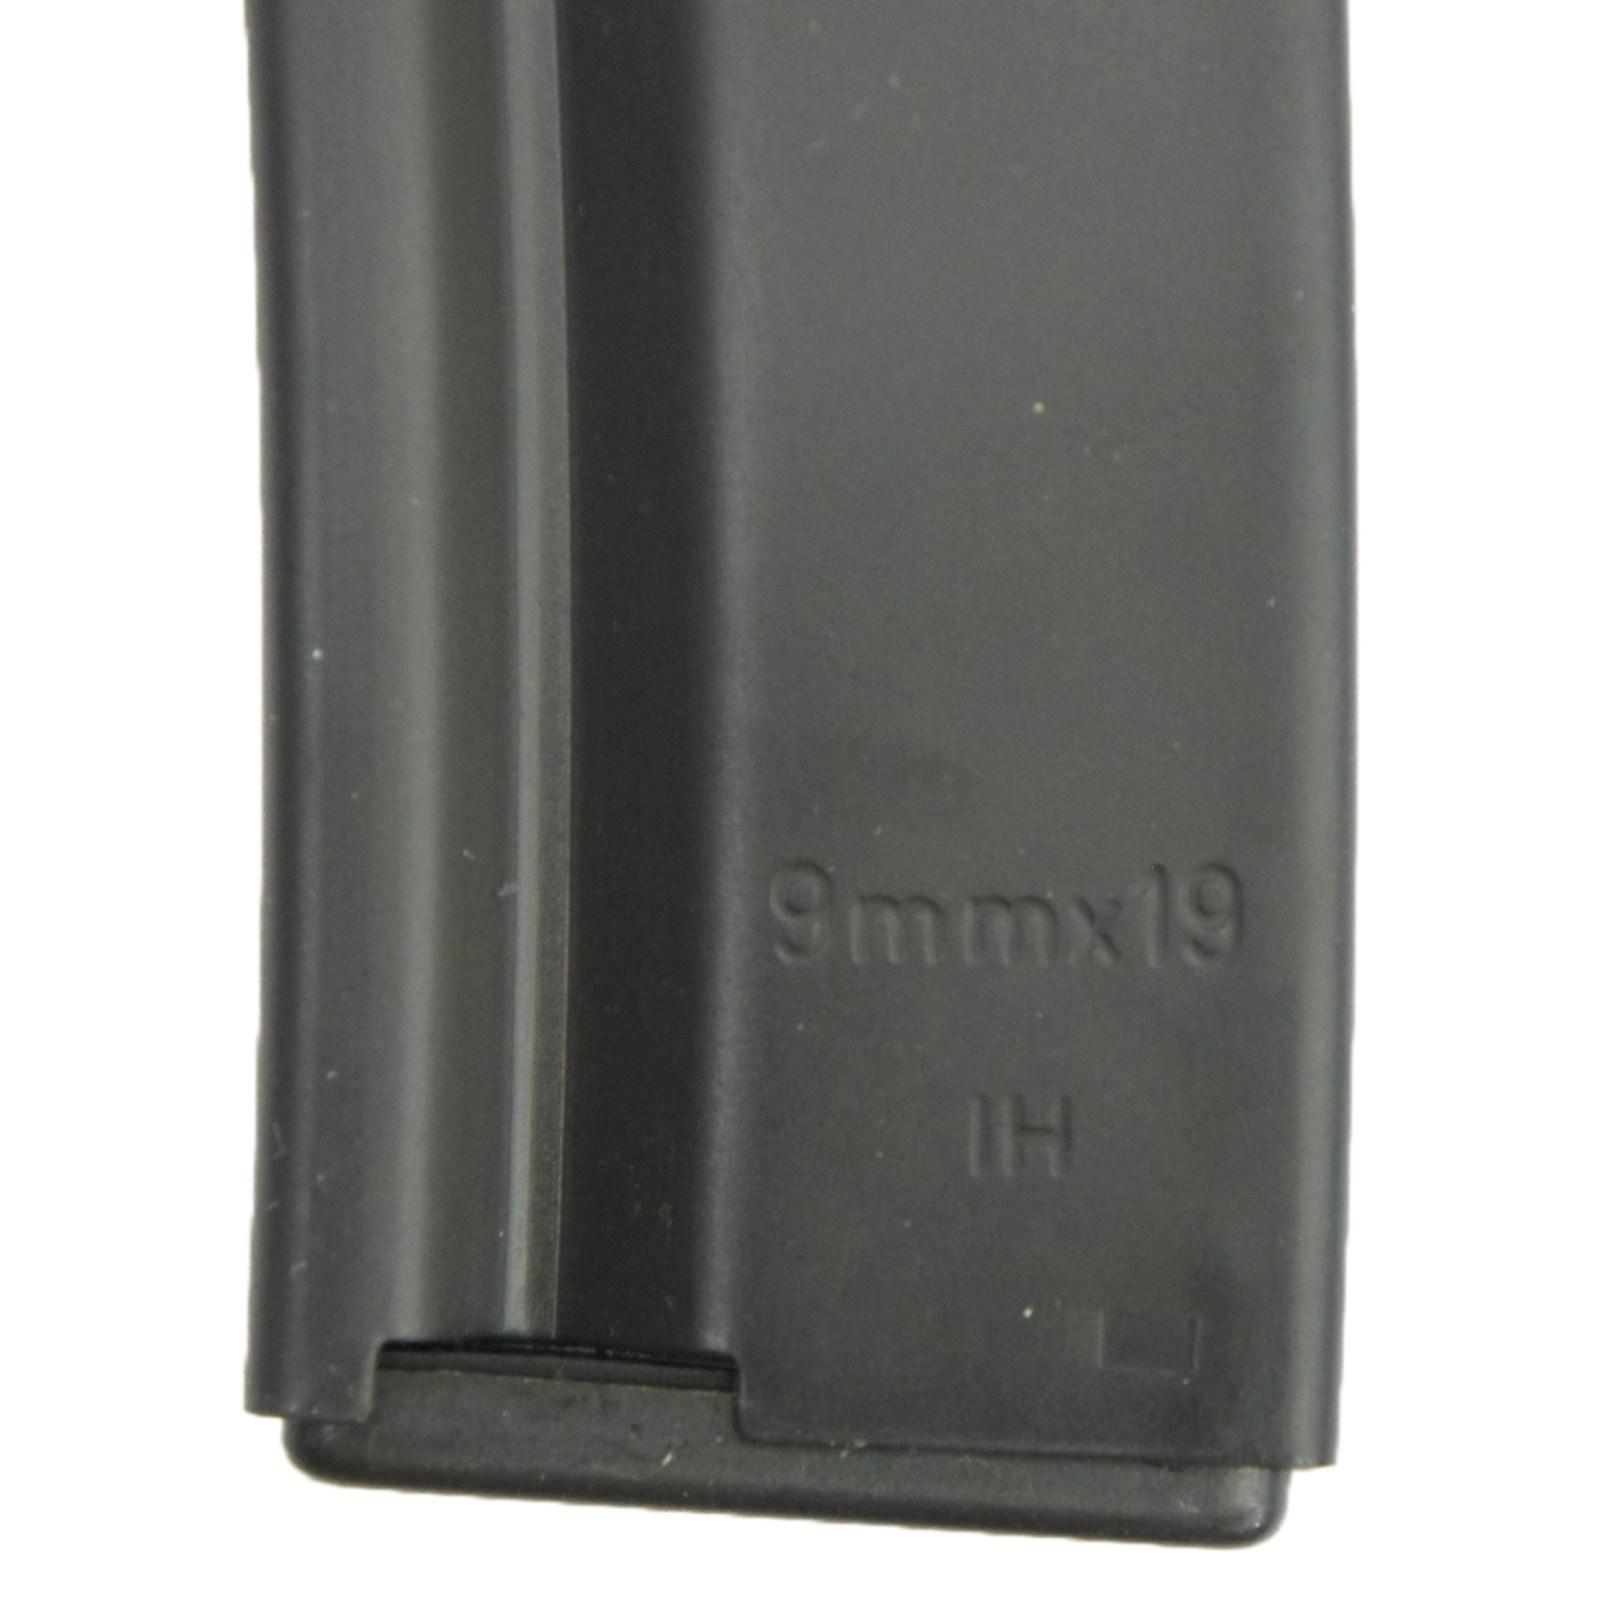 Umarex/VFC MP5 GBBR Gen.2 スペアマガジン (30連) [VFC OEM] 【品番:VF9J-MAG-MP5G30-BK03】